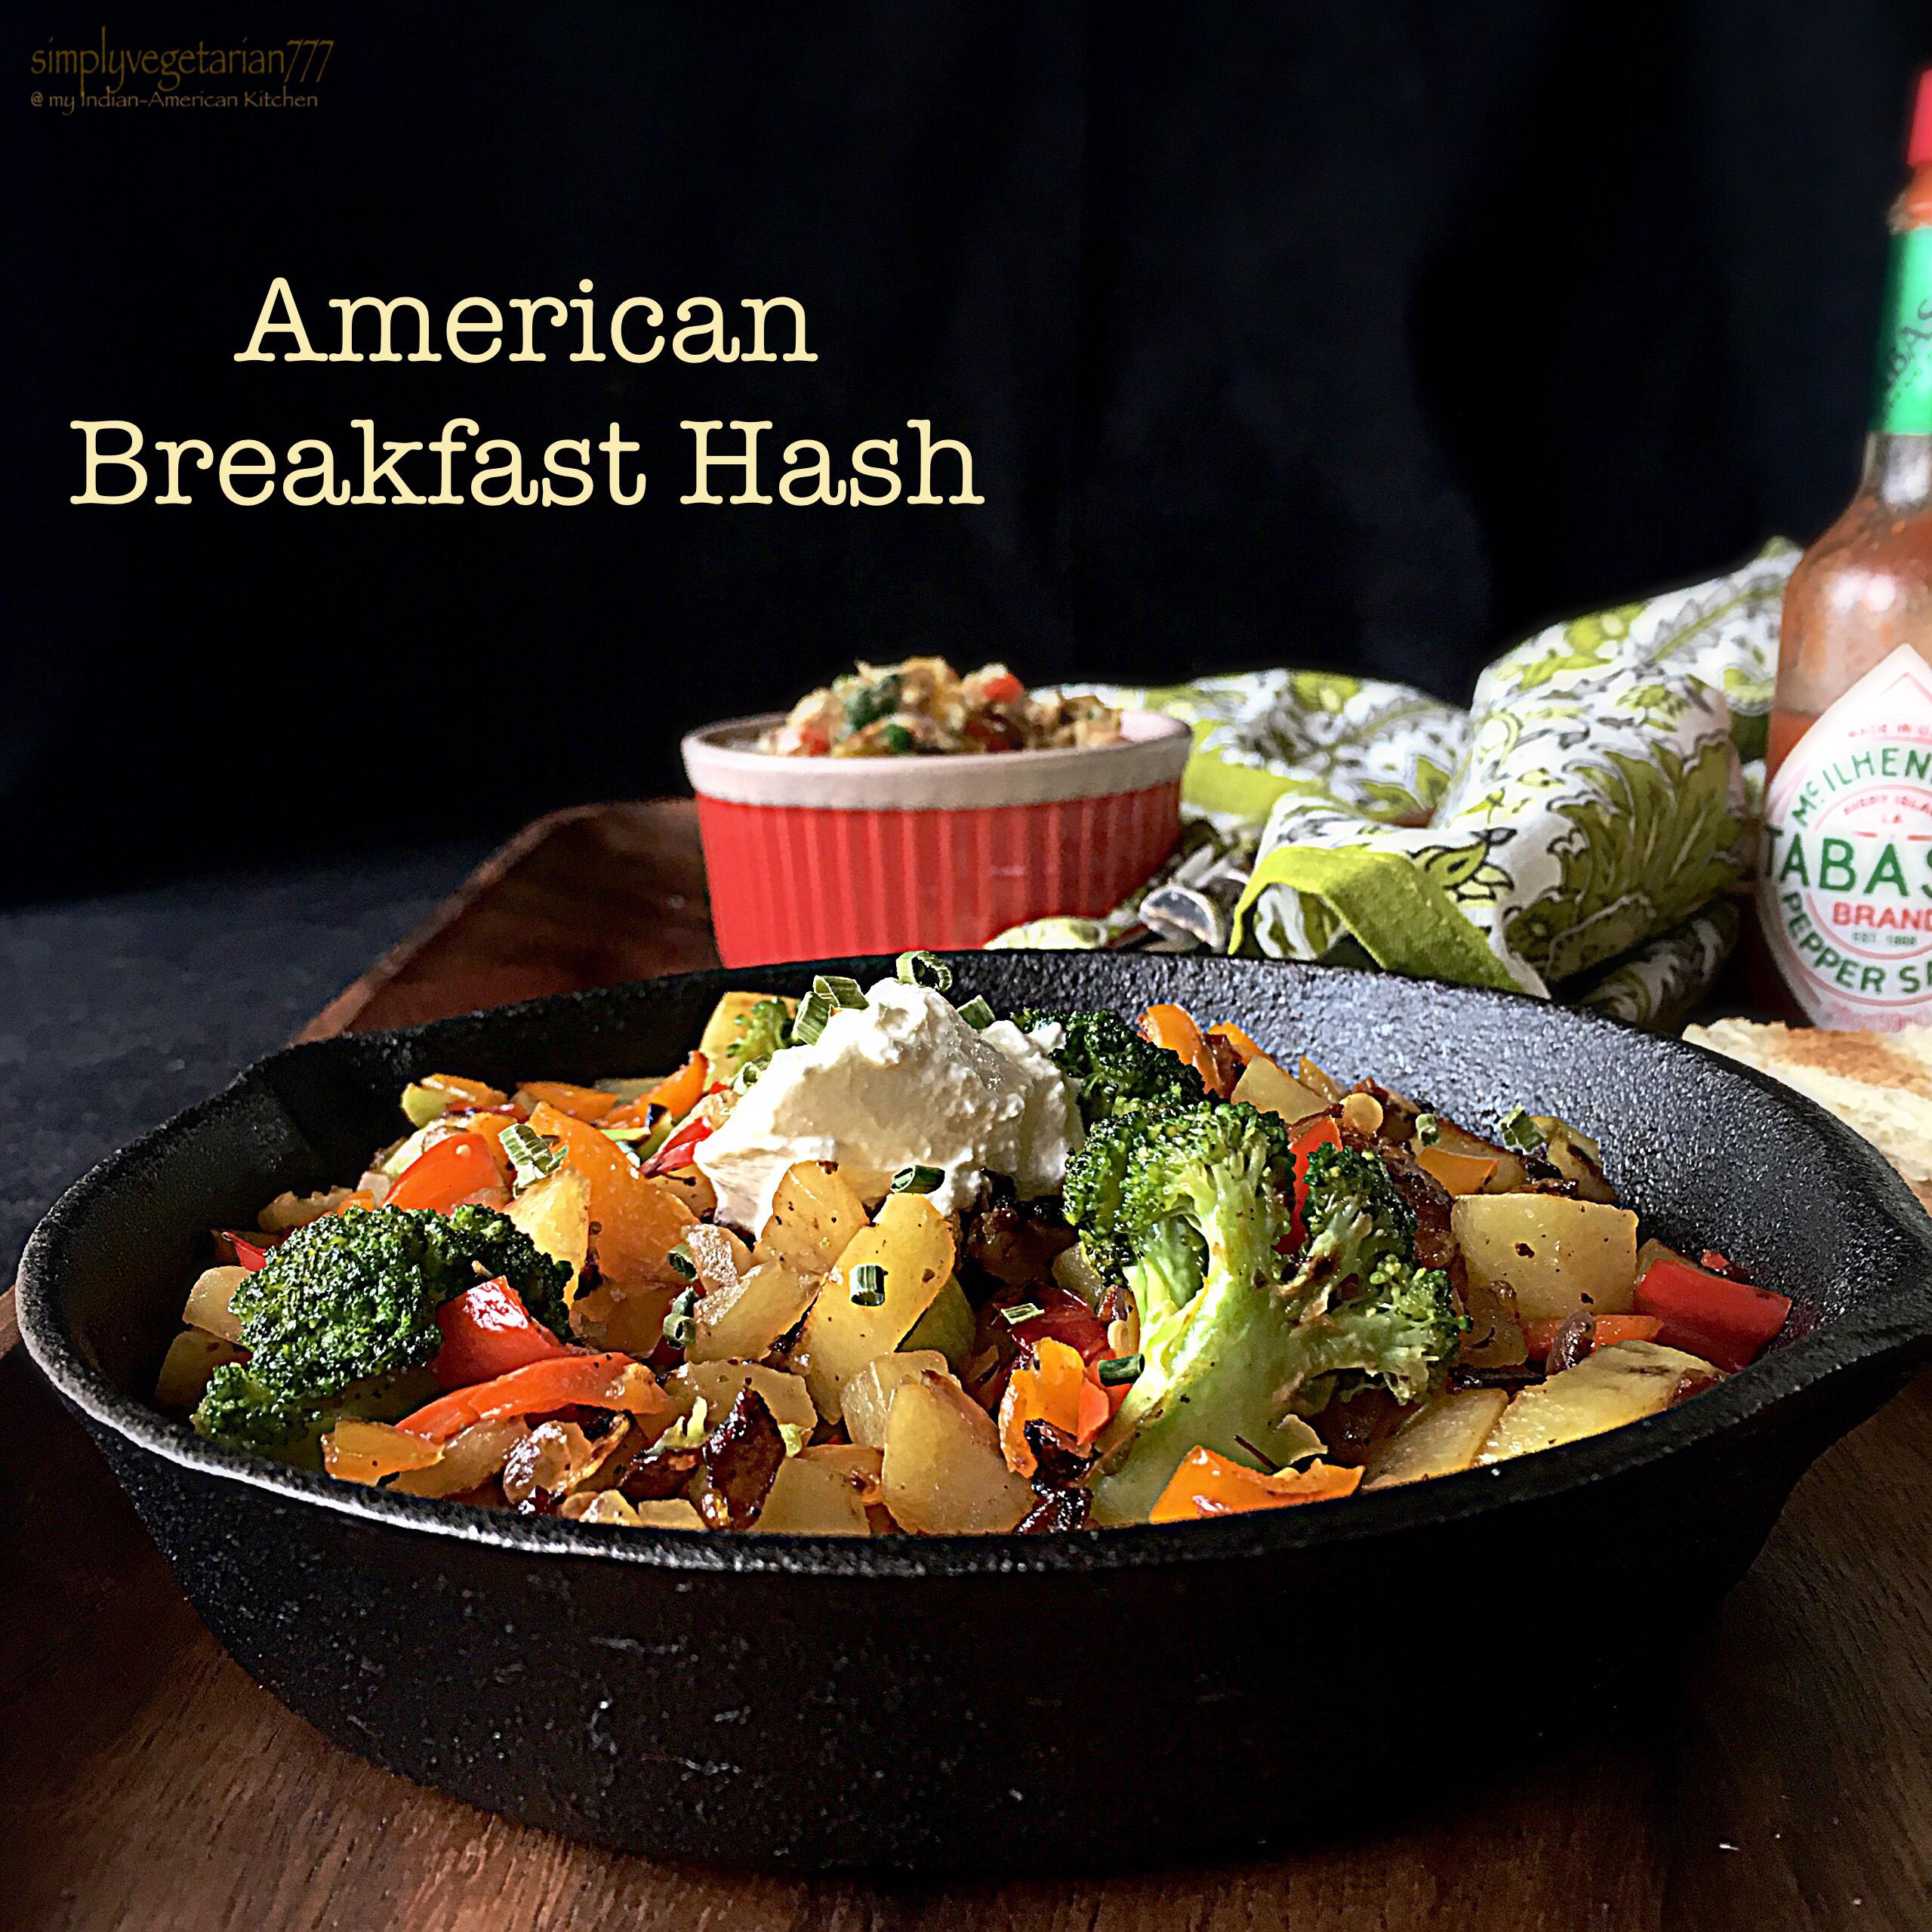 American Breakfast Hash